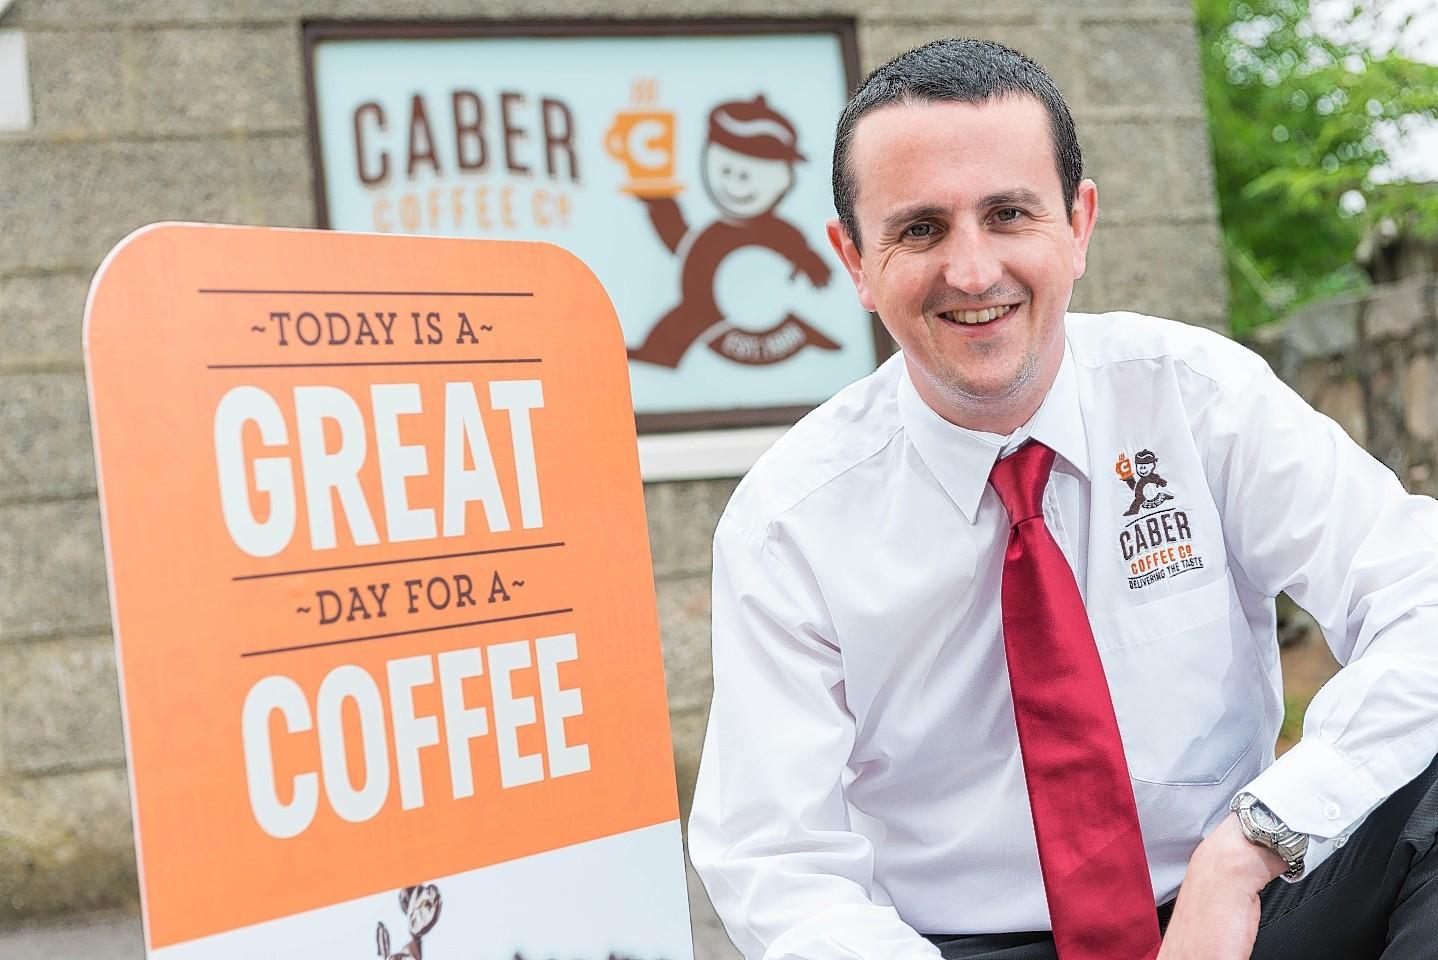 Caber Coffee managing director Findlay Leask